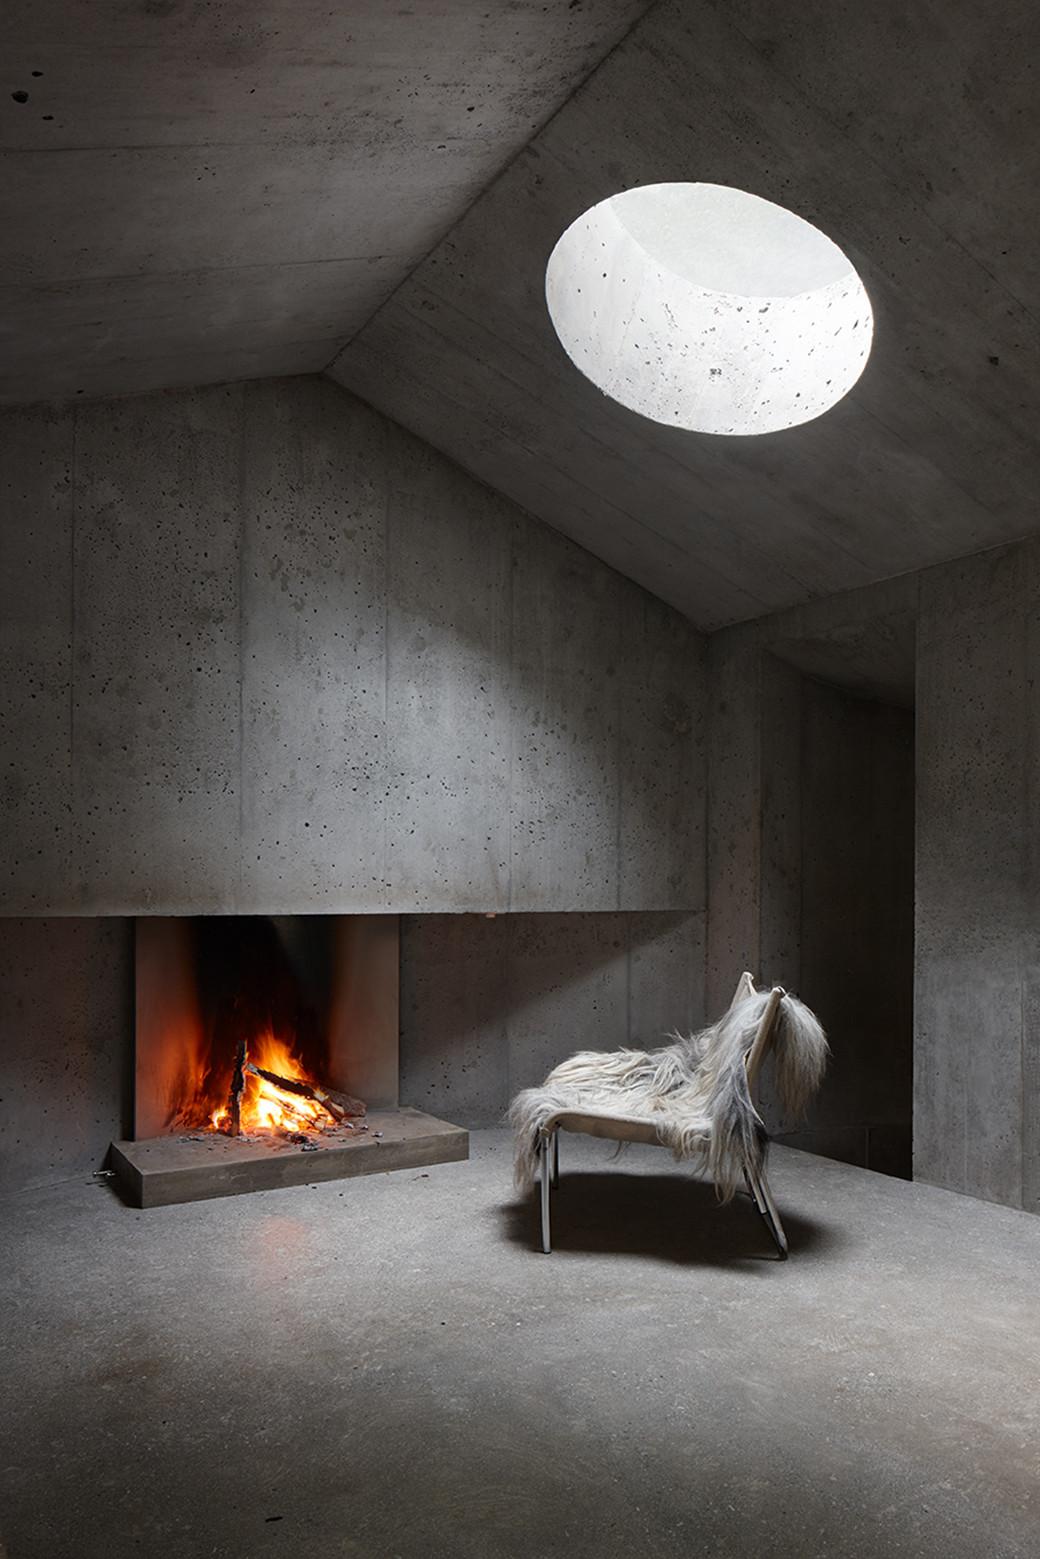 galeria de ref gio lieptgas georg nickisch selina walder 8. Black Bedroom Furniture Sets. Home Design Ideas